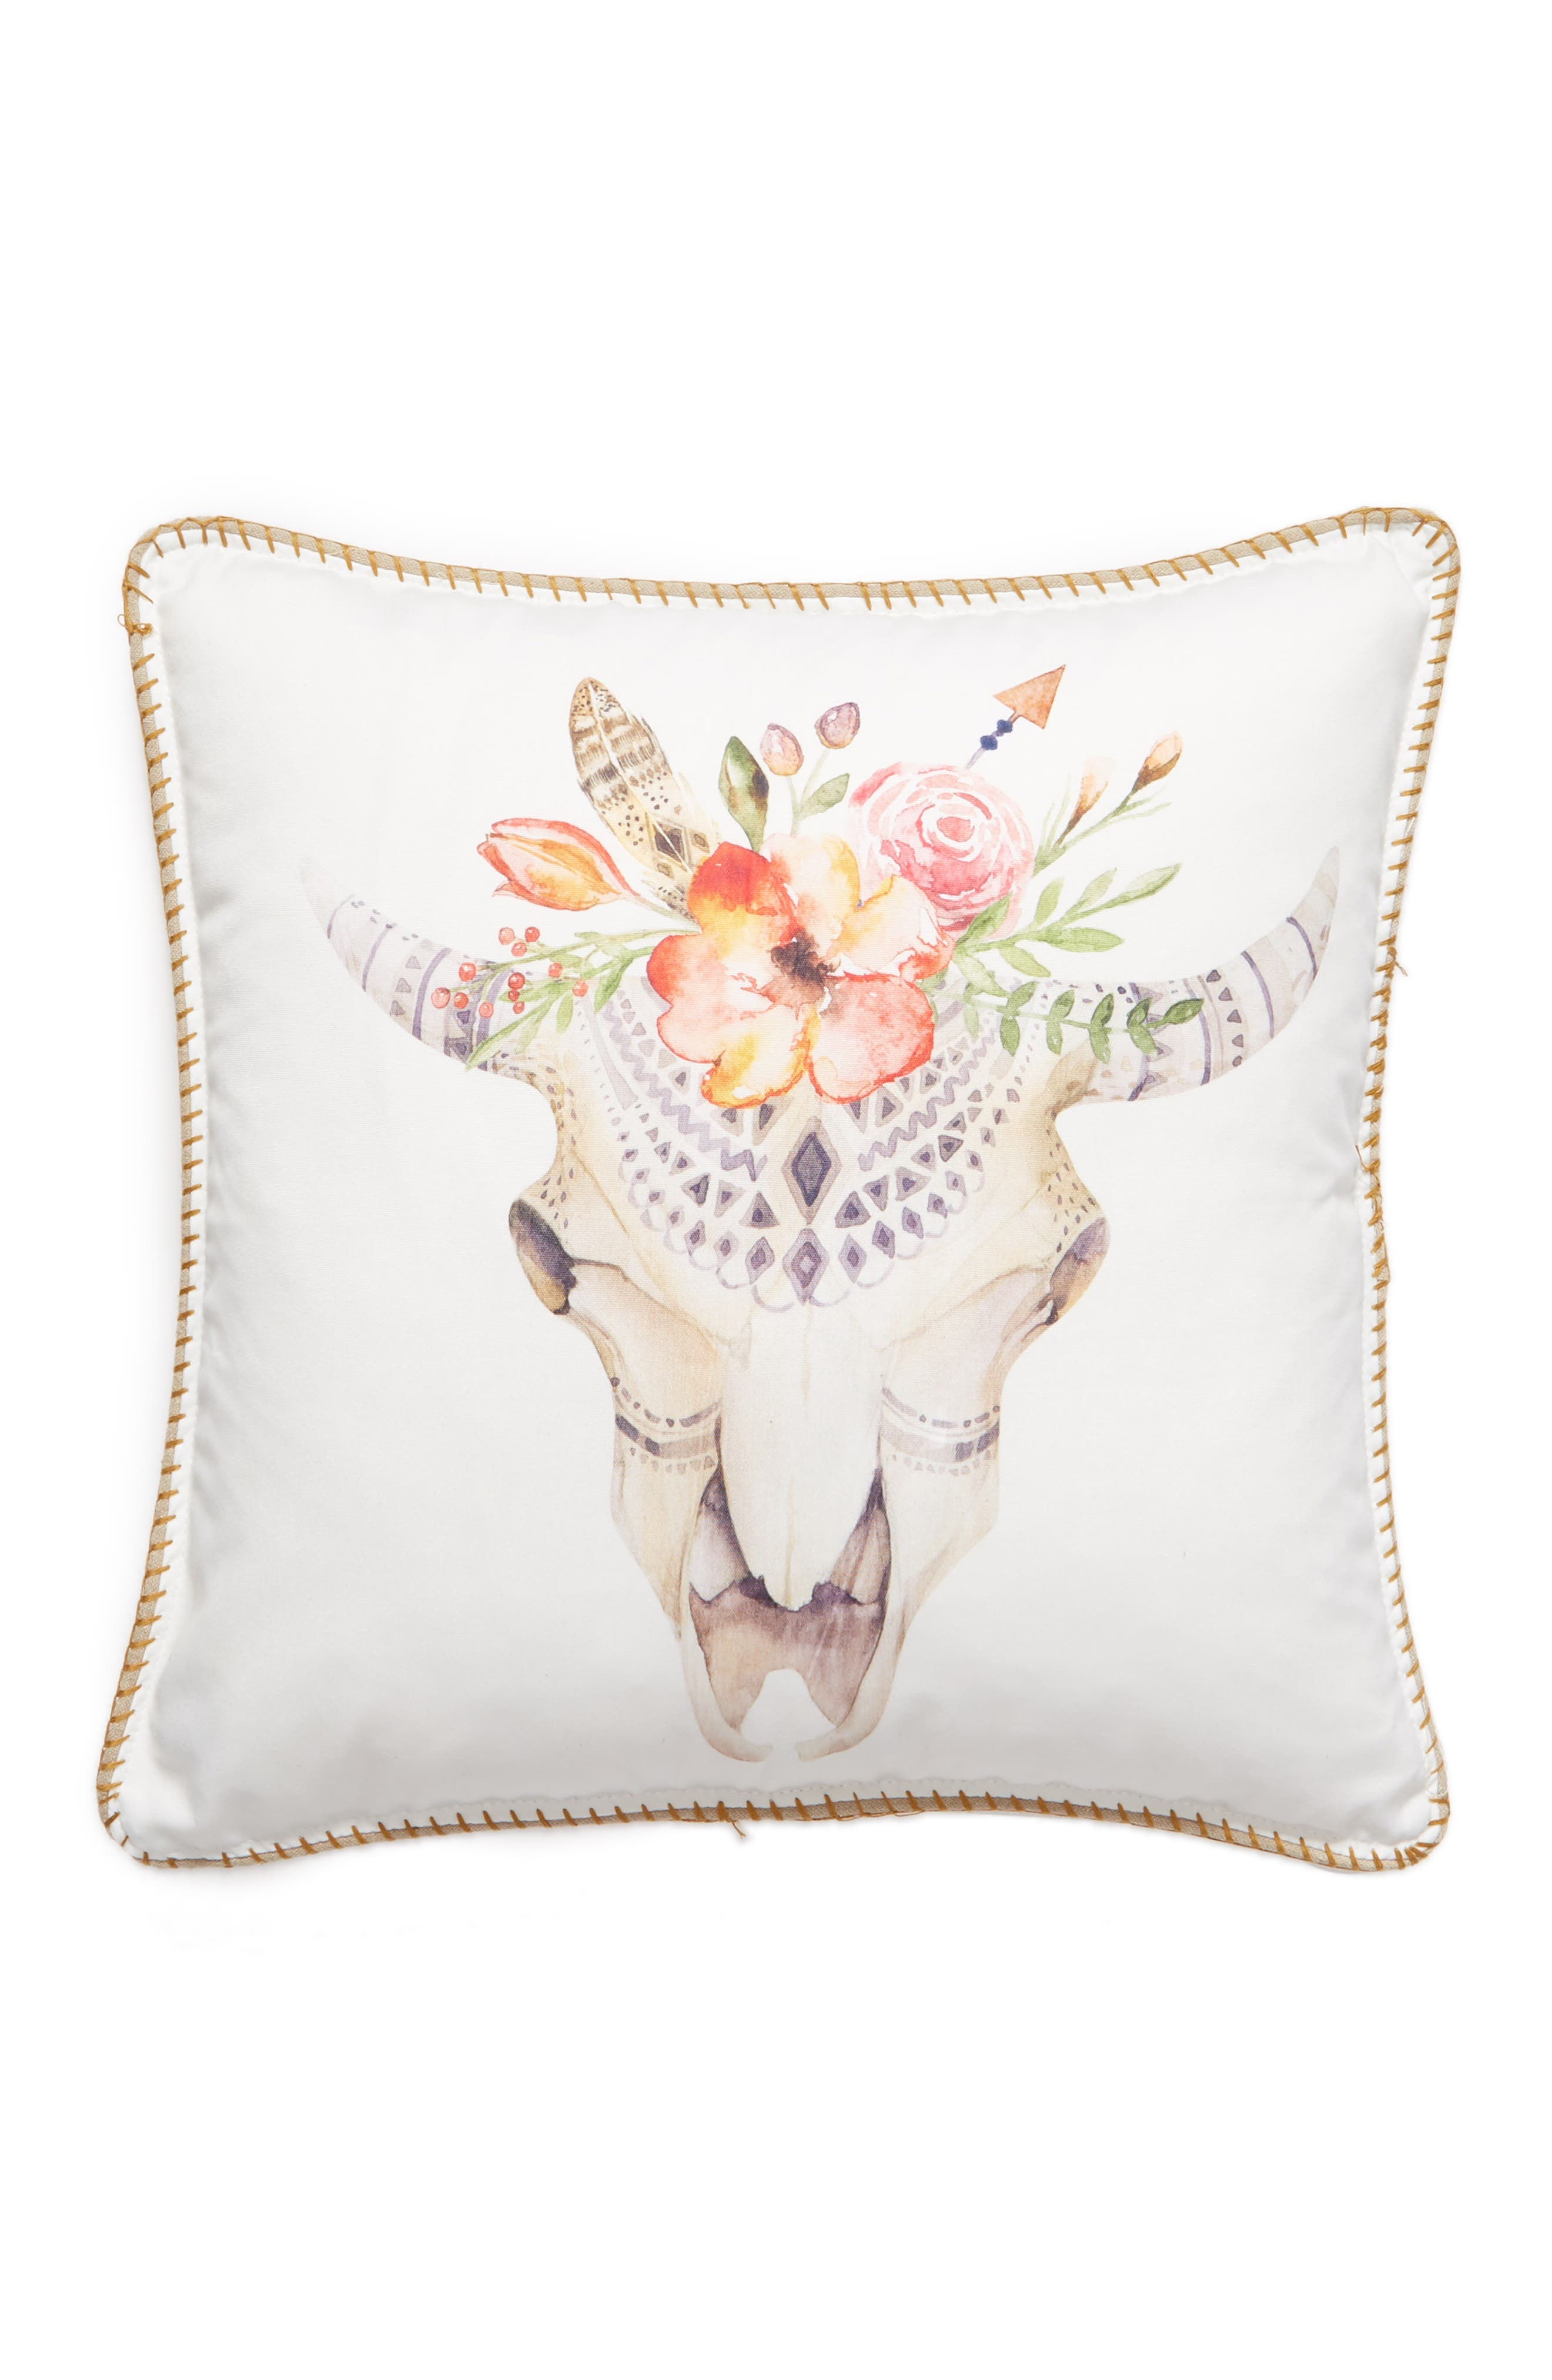 Jordan Skull Accent Pillow,                         Main,                         color, 900